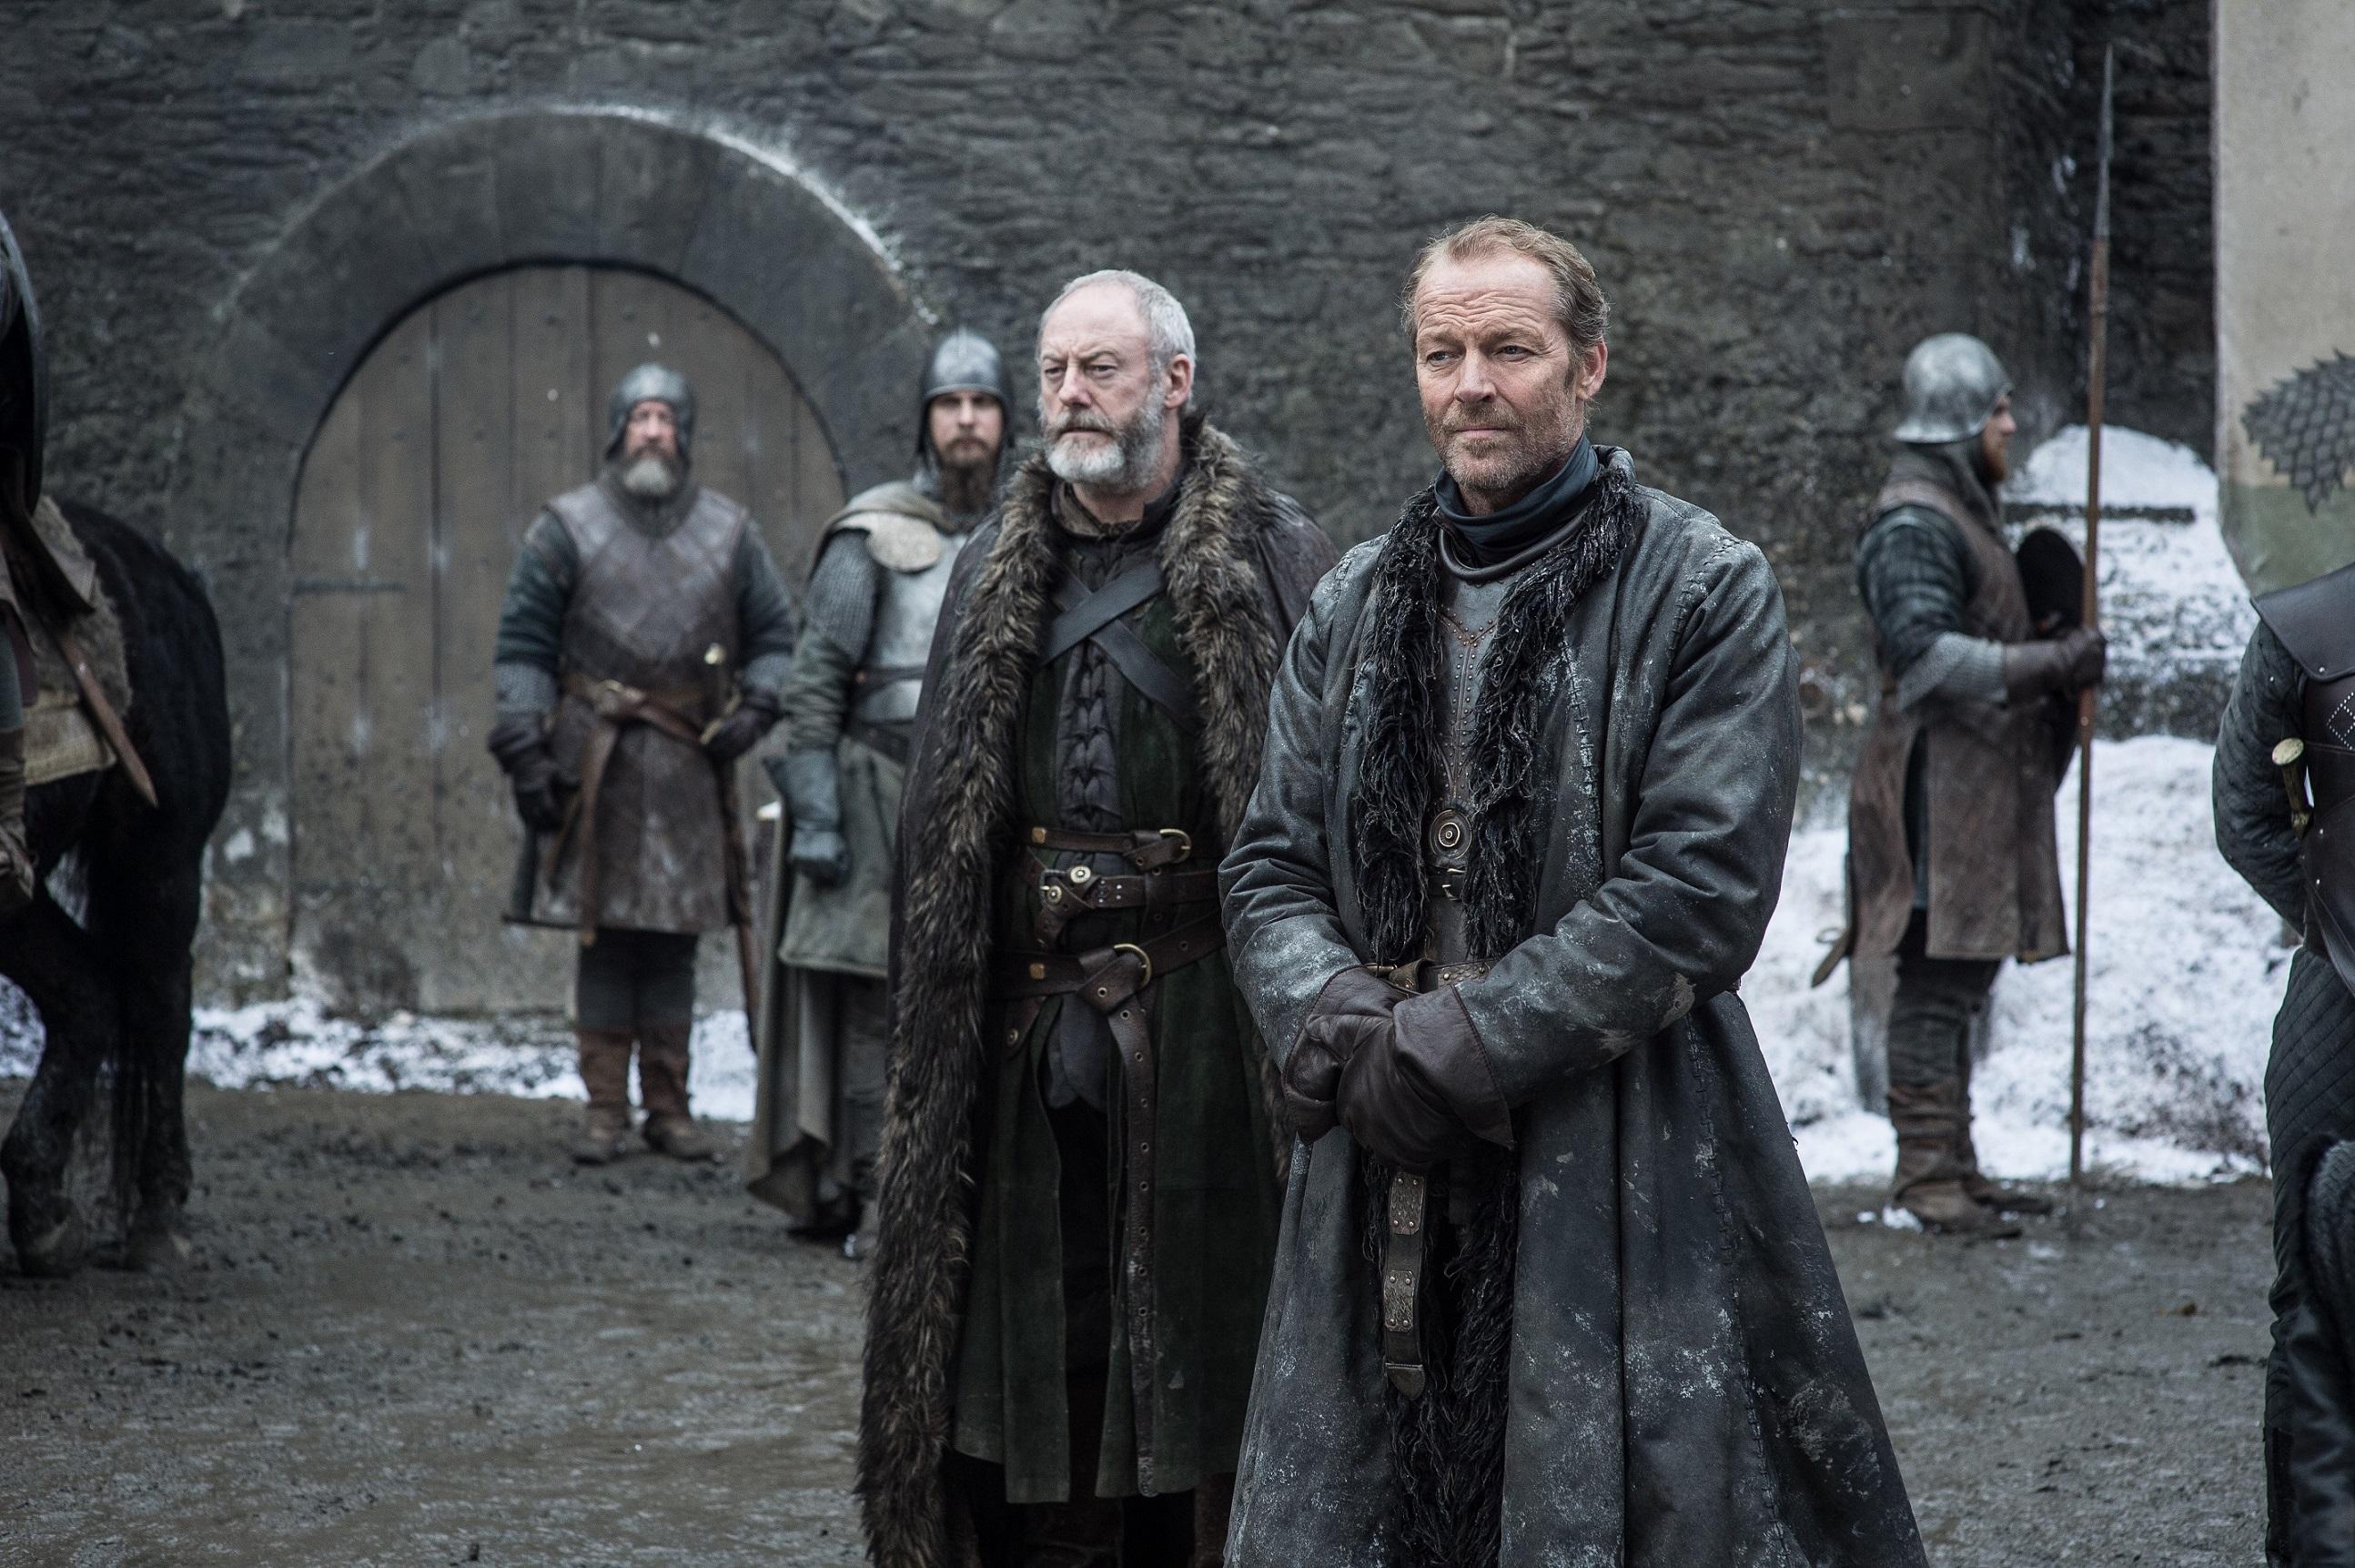 Davos Seaworth Jorah Mormont Season 8